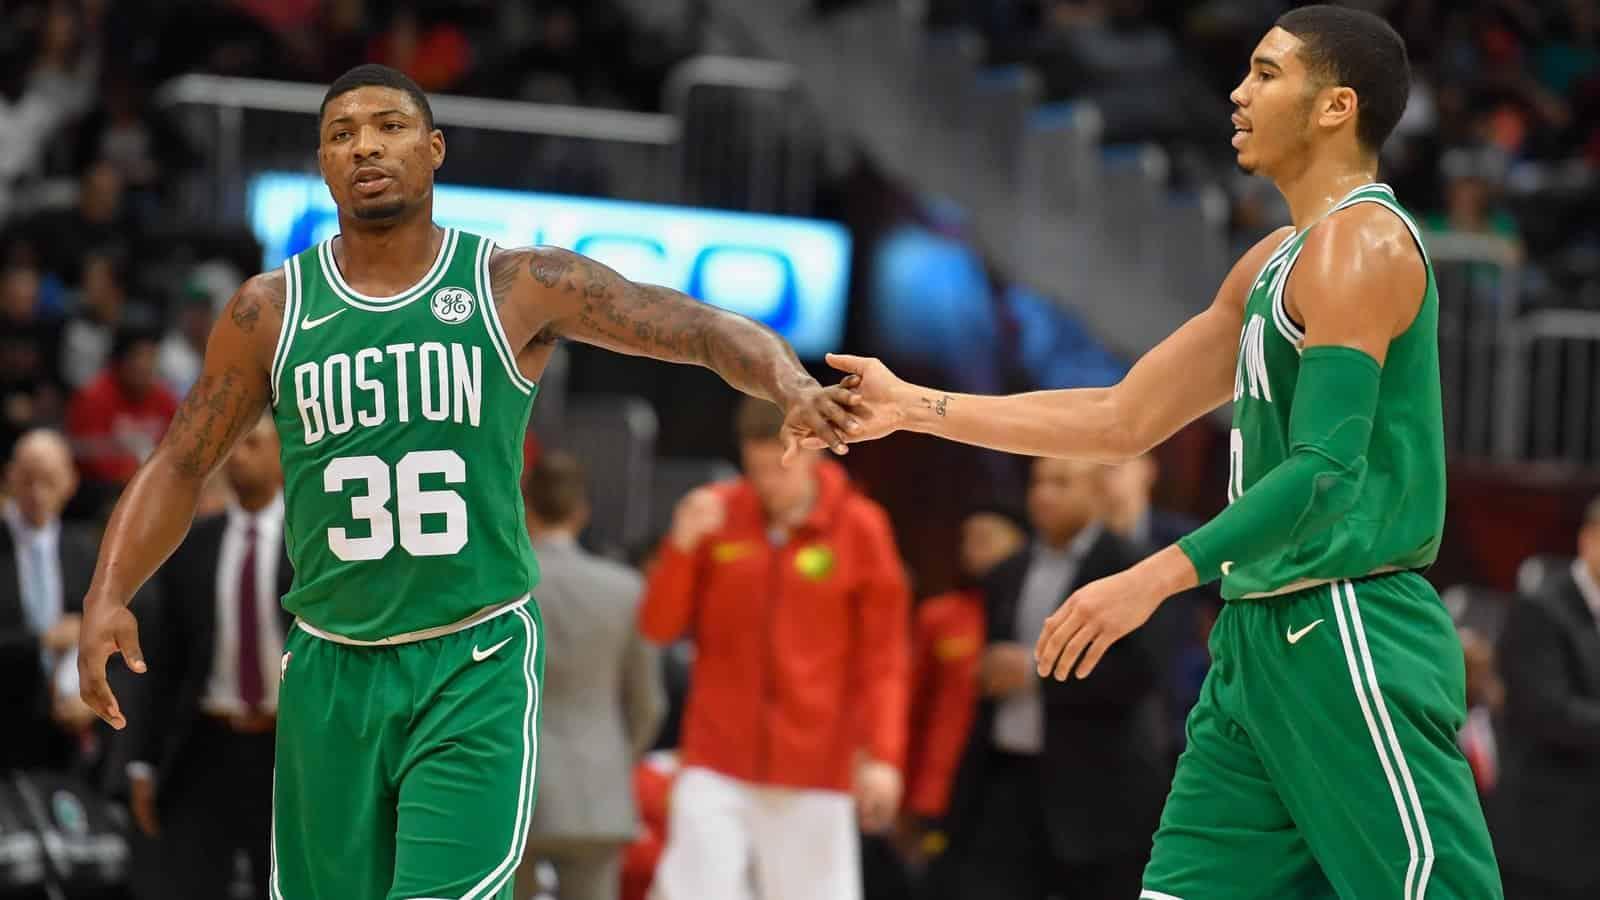 BasketballNcaa - Boston Celtics